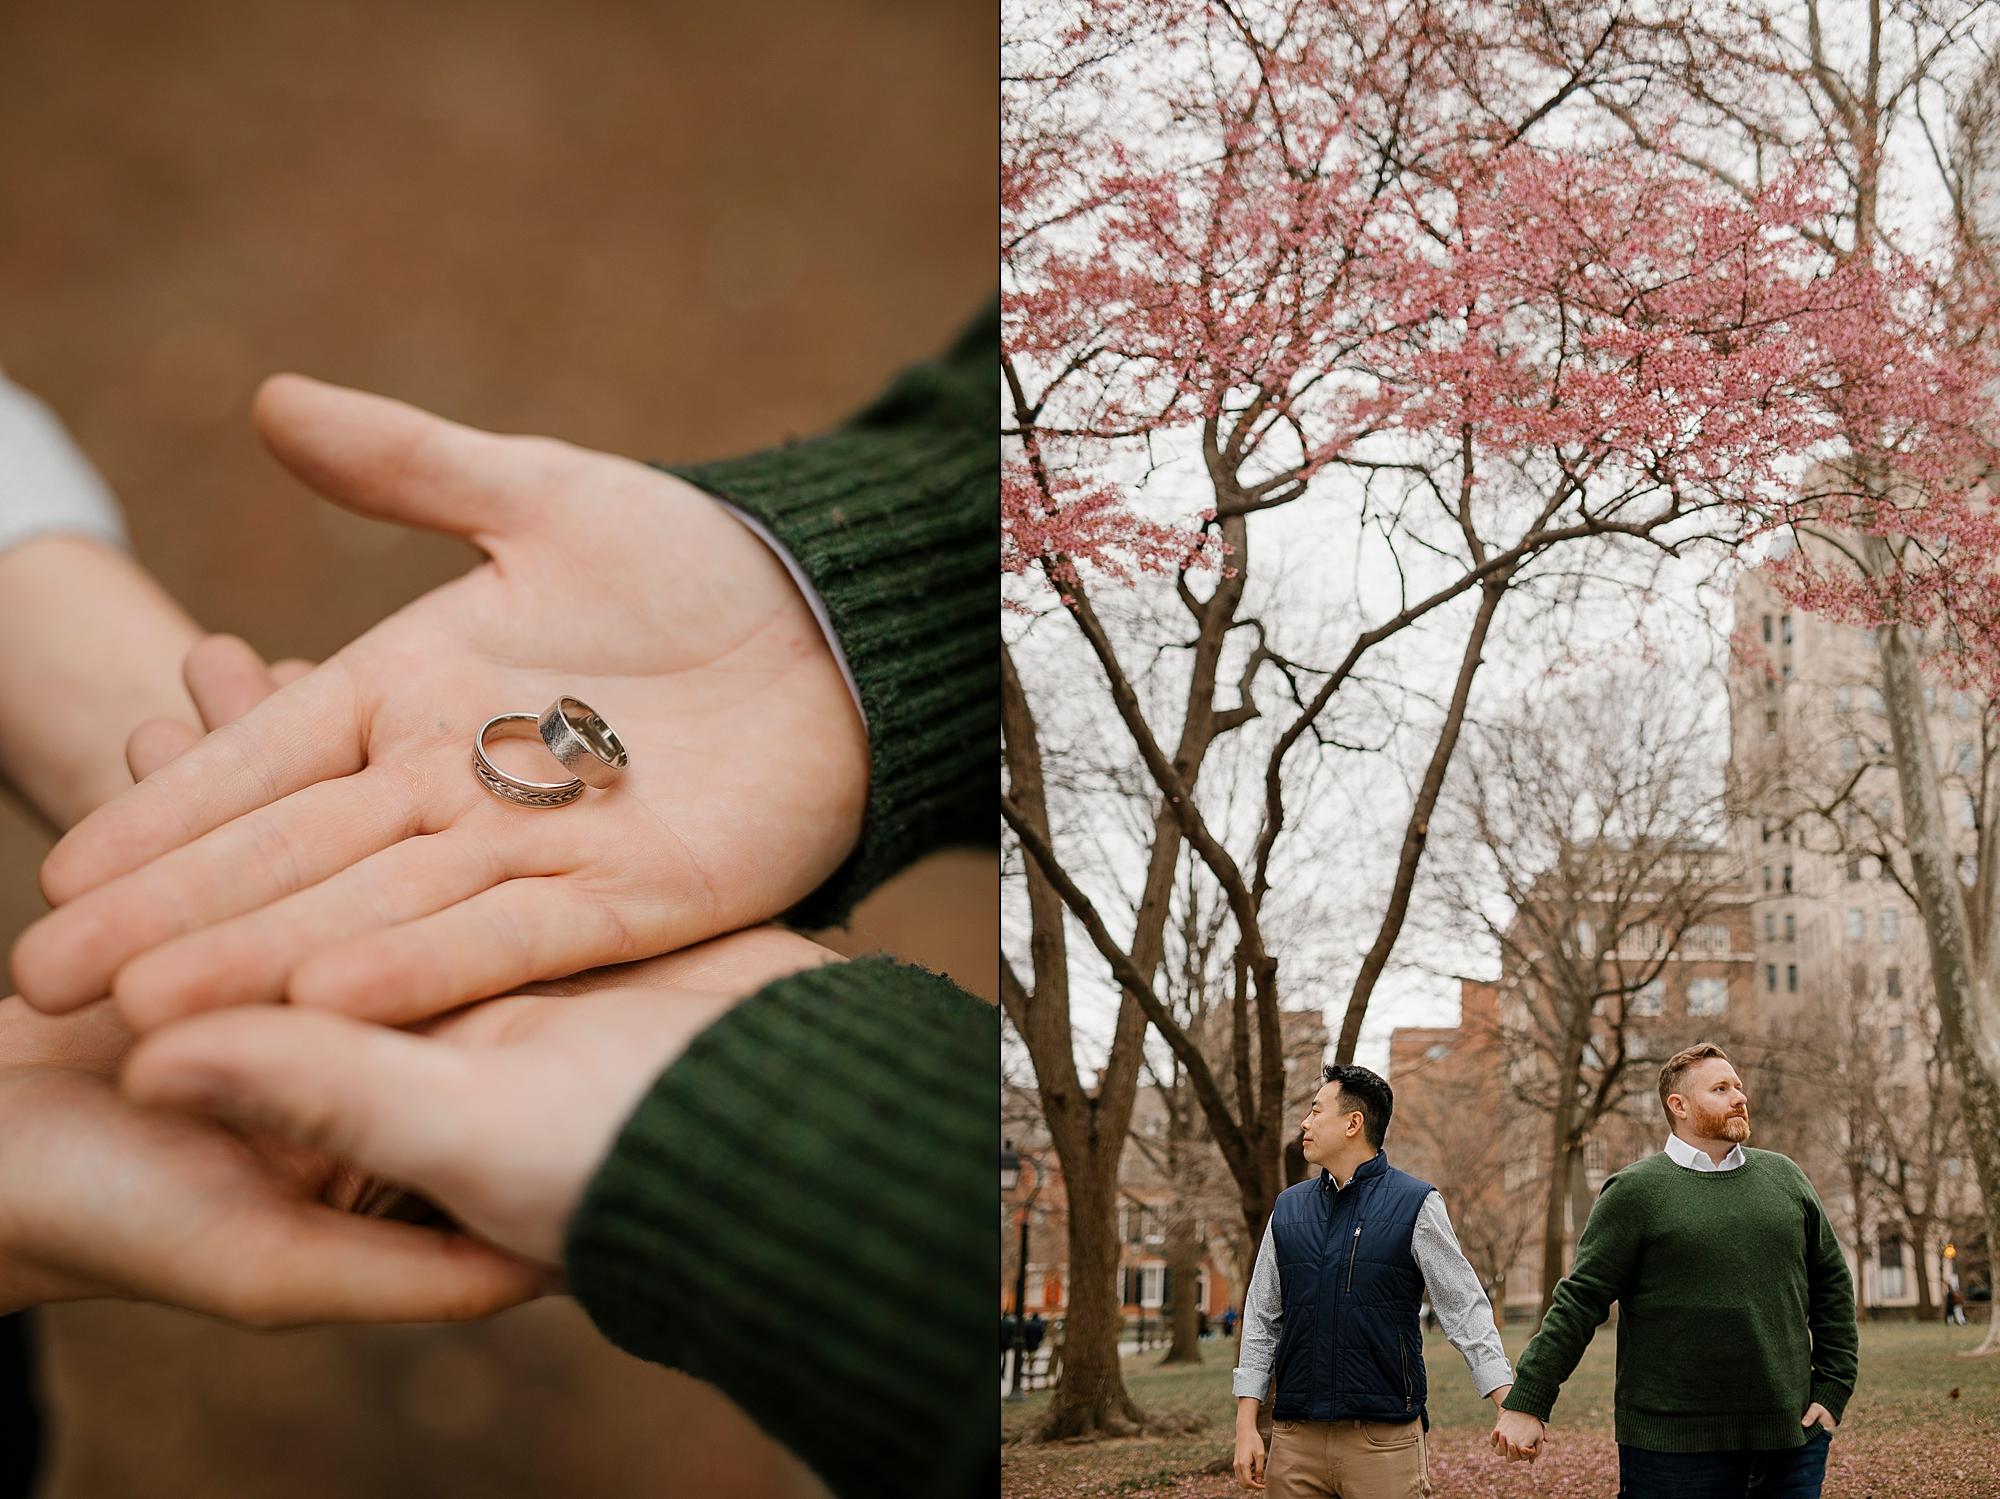 Love_BY_Joe_Mac_Creative_Philadelphia_Philly_Wedding_Photography_Gay_LGBT_Queer_Washington_Square_Park_Philadelphia__0037.jpg